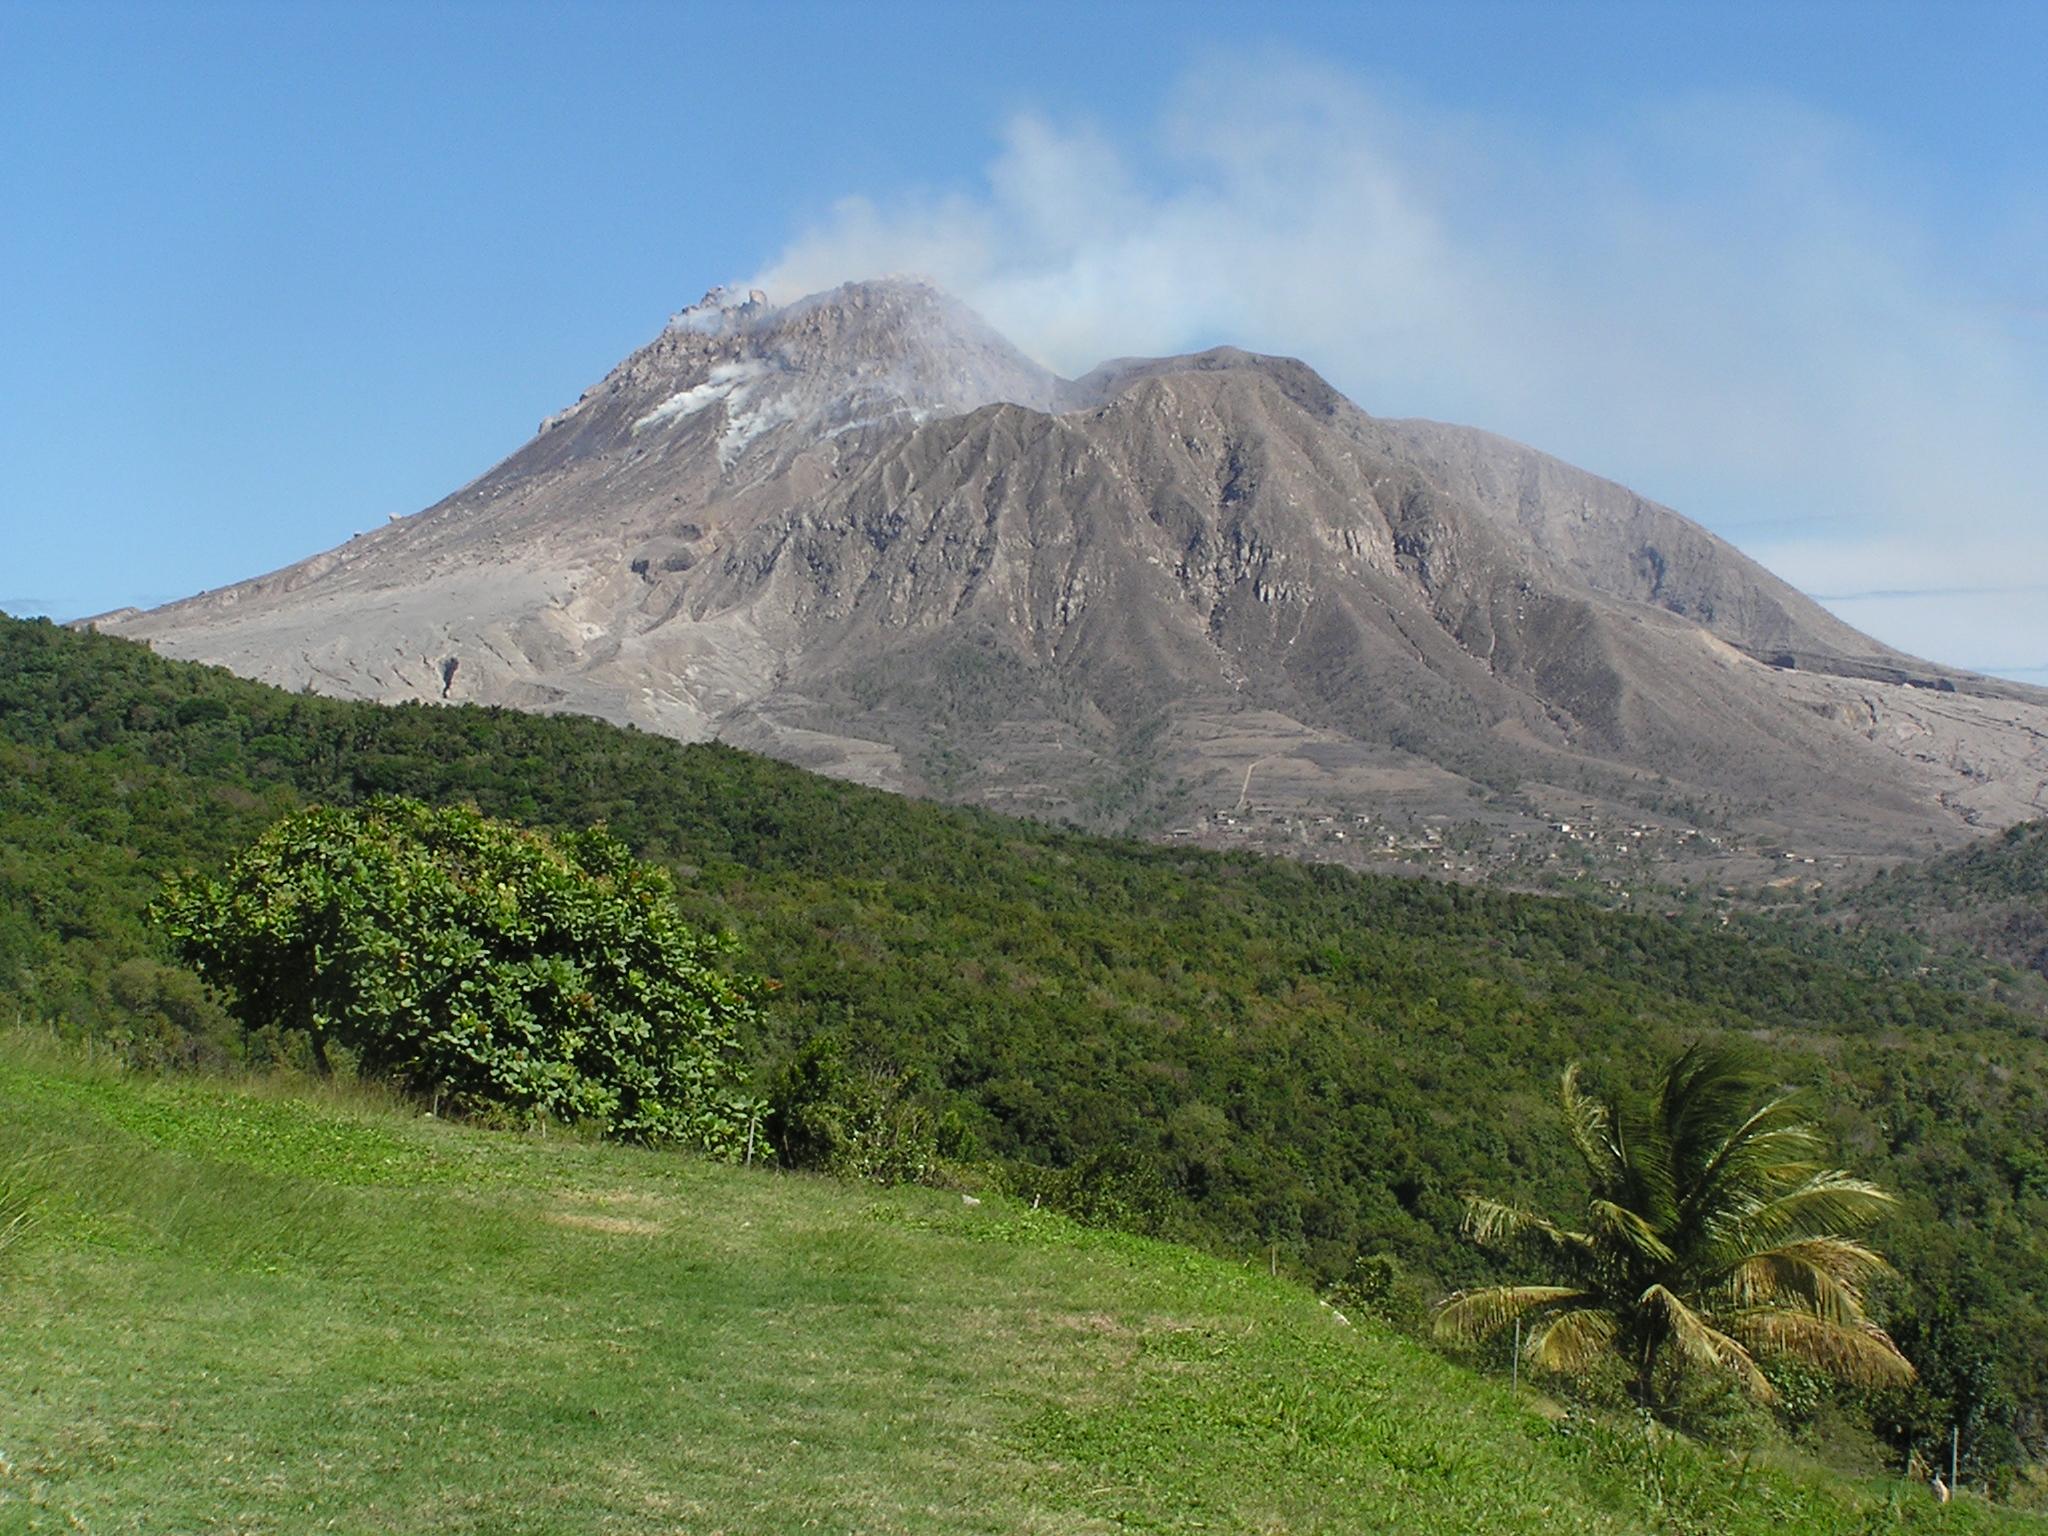 an analysis of the soufriere hills volcano eruption on montserrat island in 1997